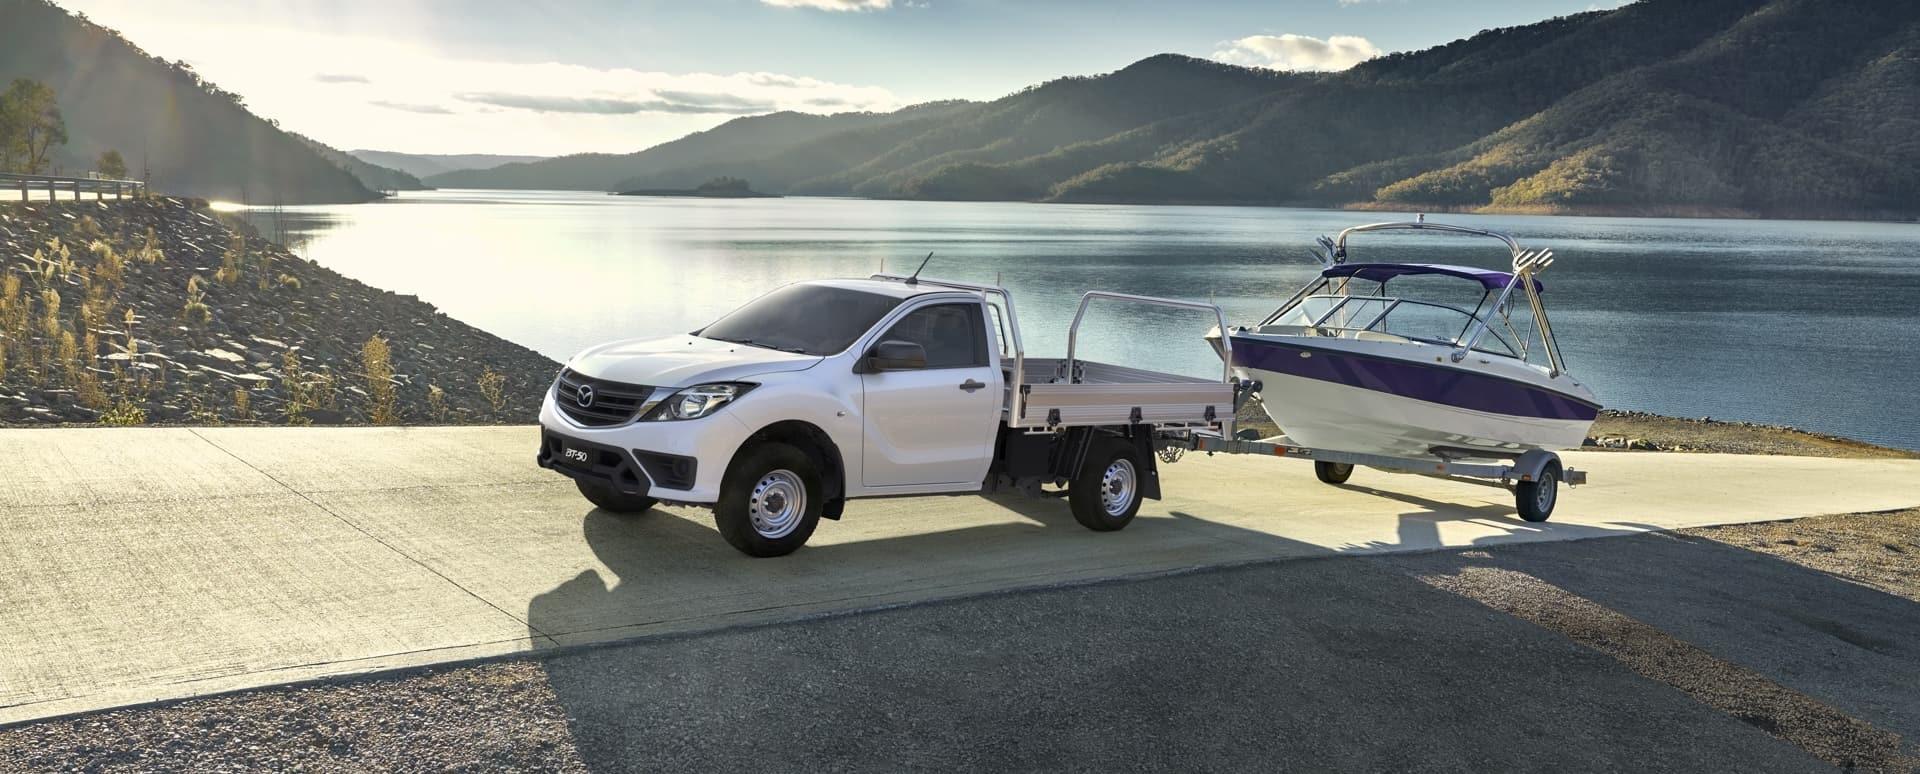 Mazda BT-50 and Boat